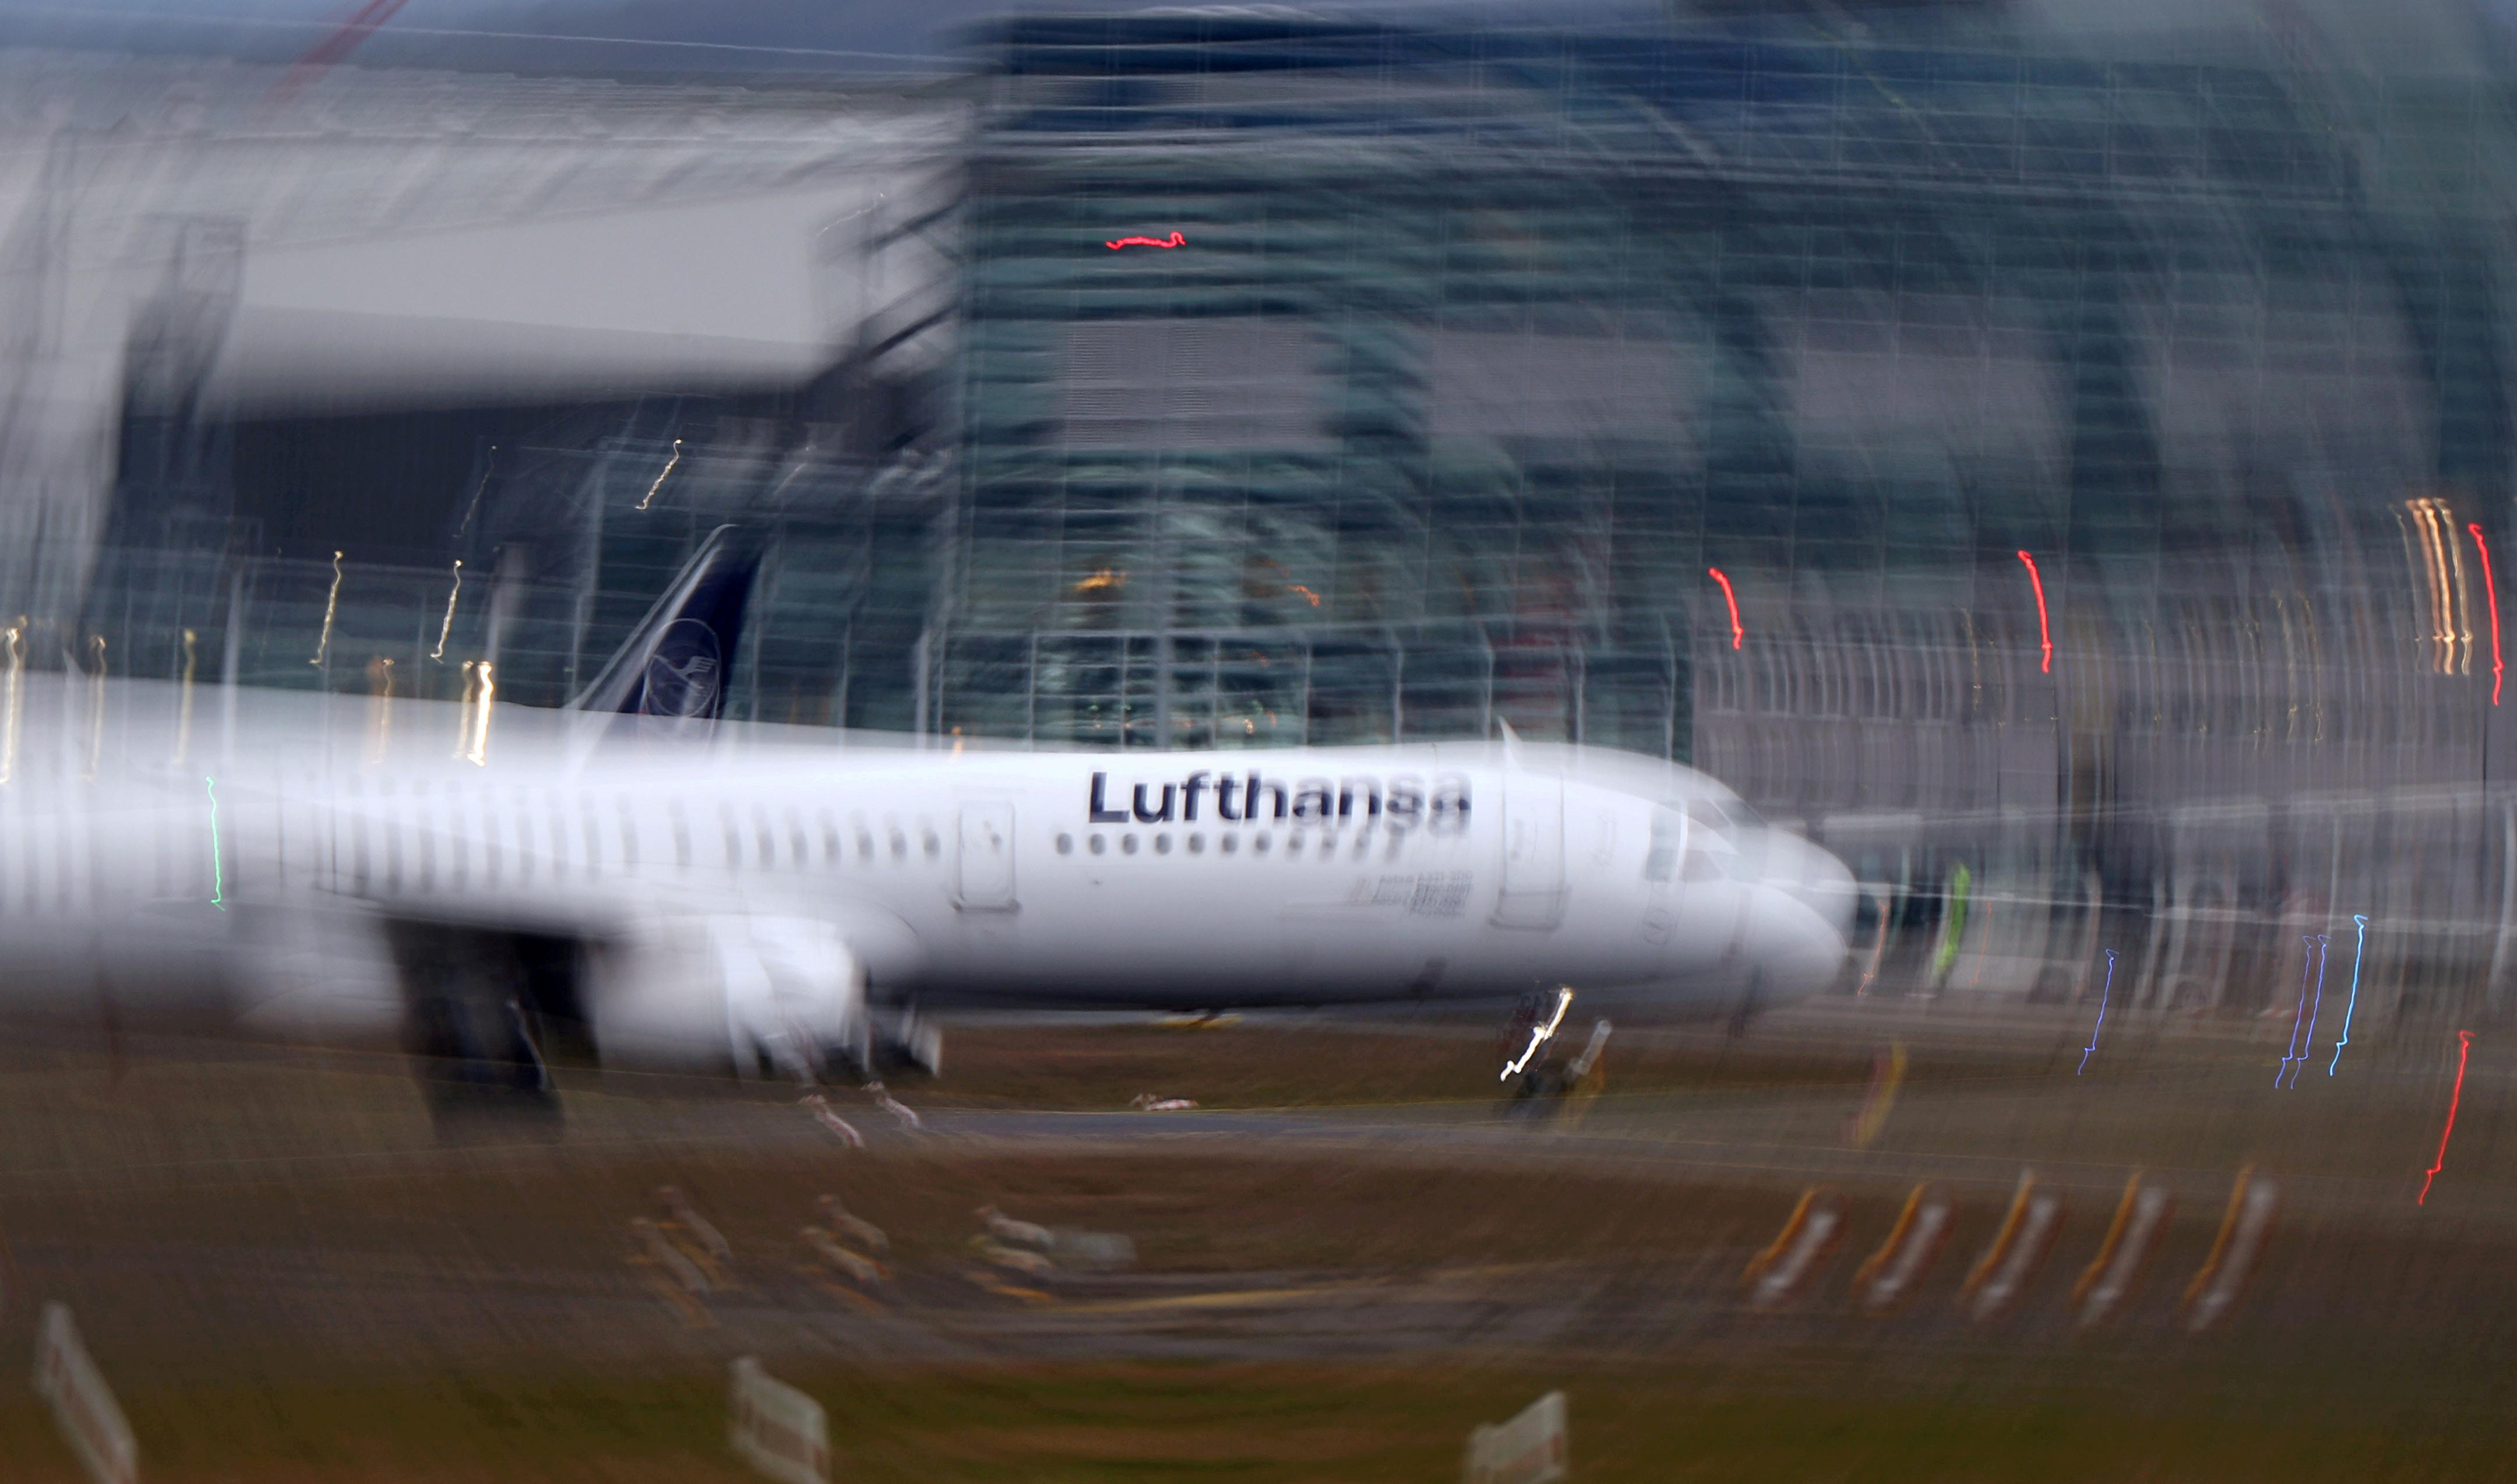 Lufthansa slashes flights as coronavirus hits bookings